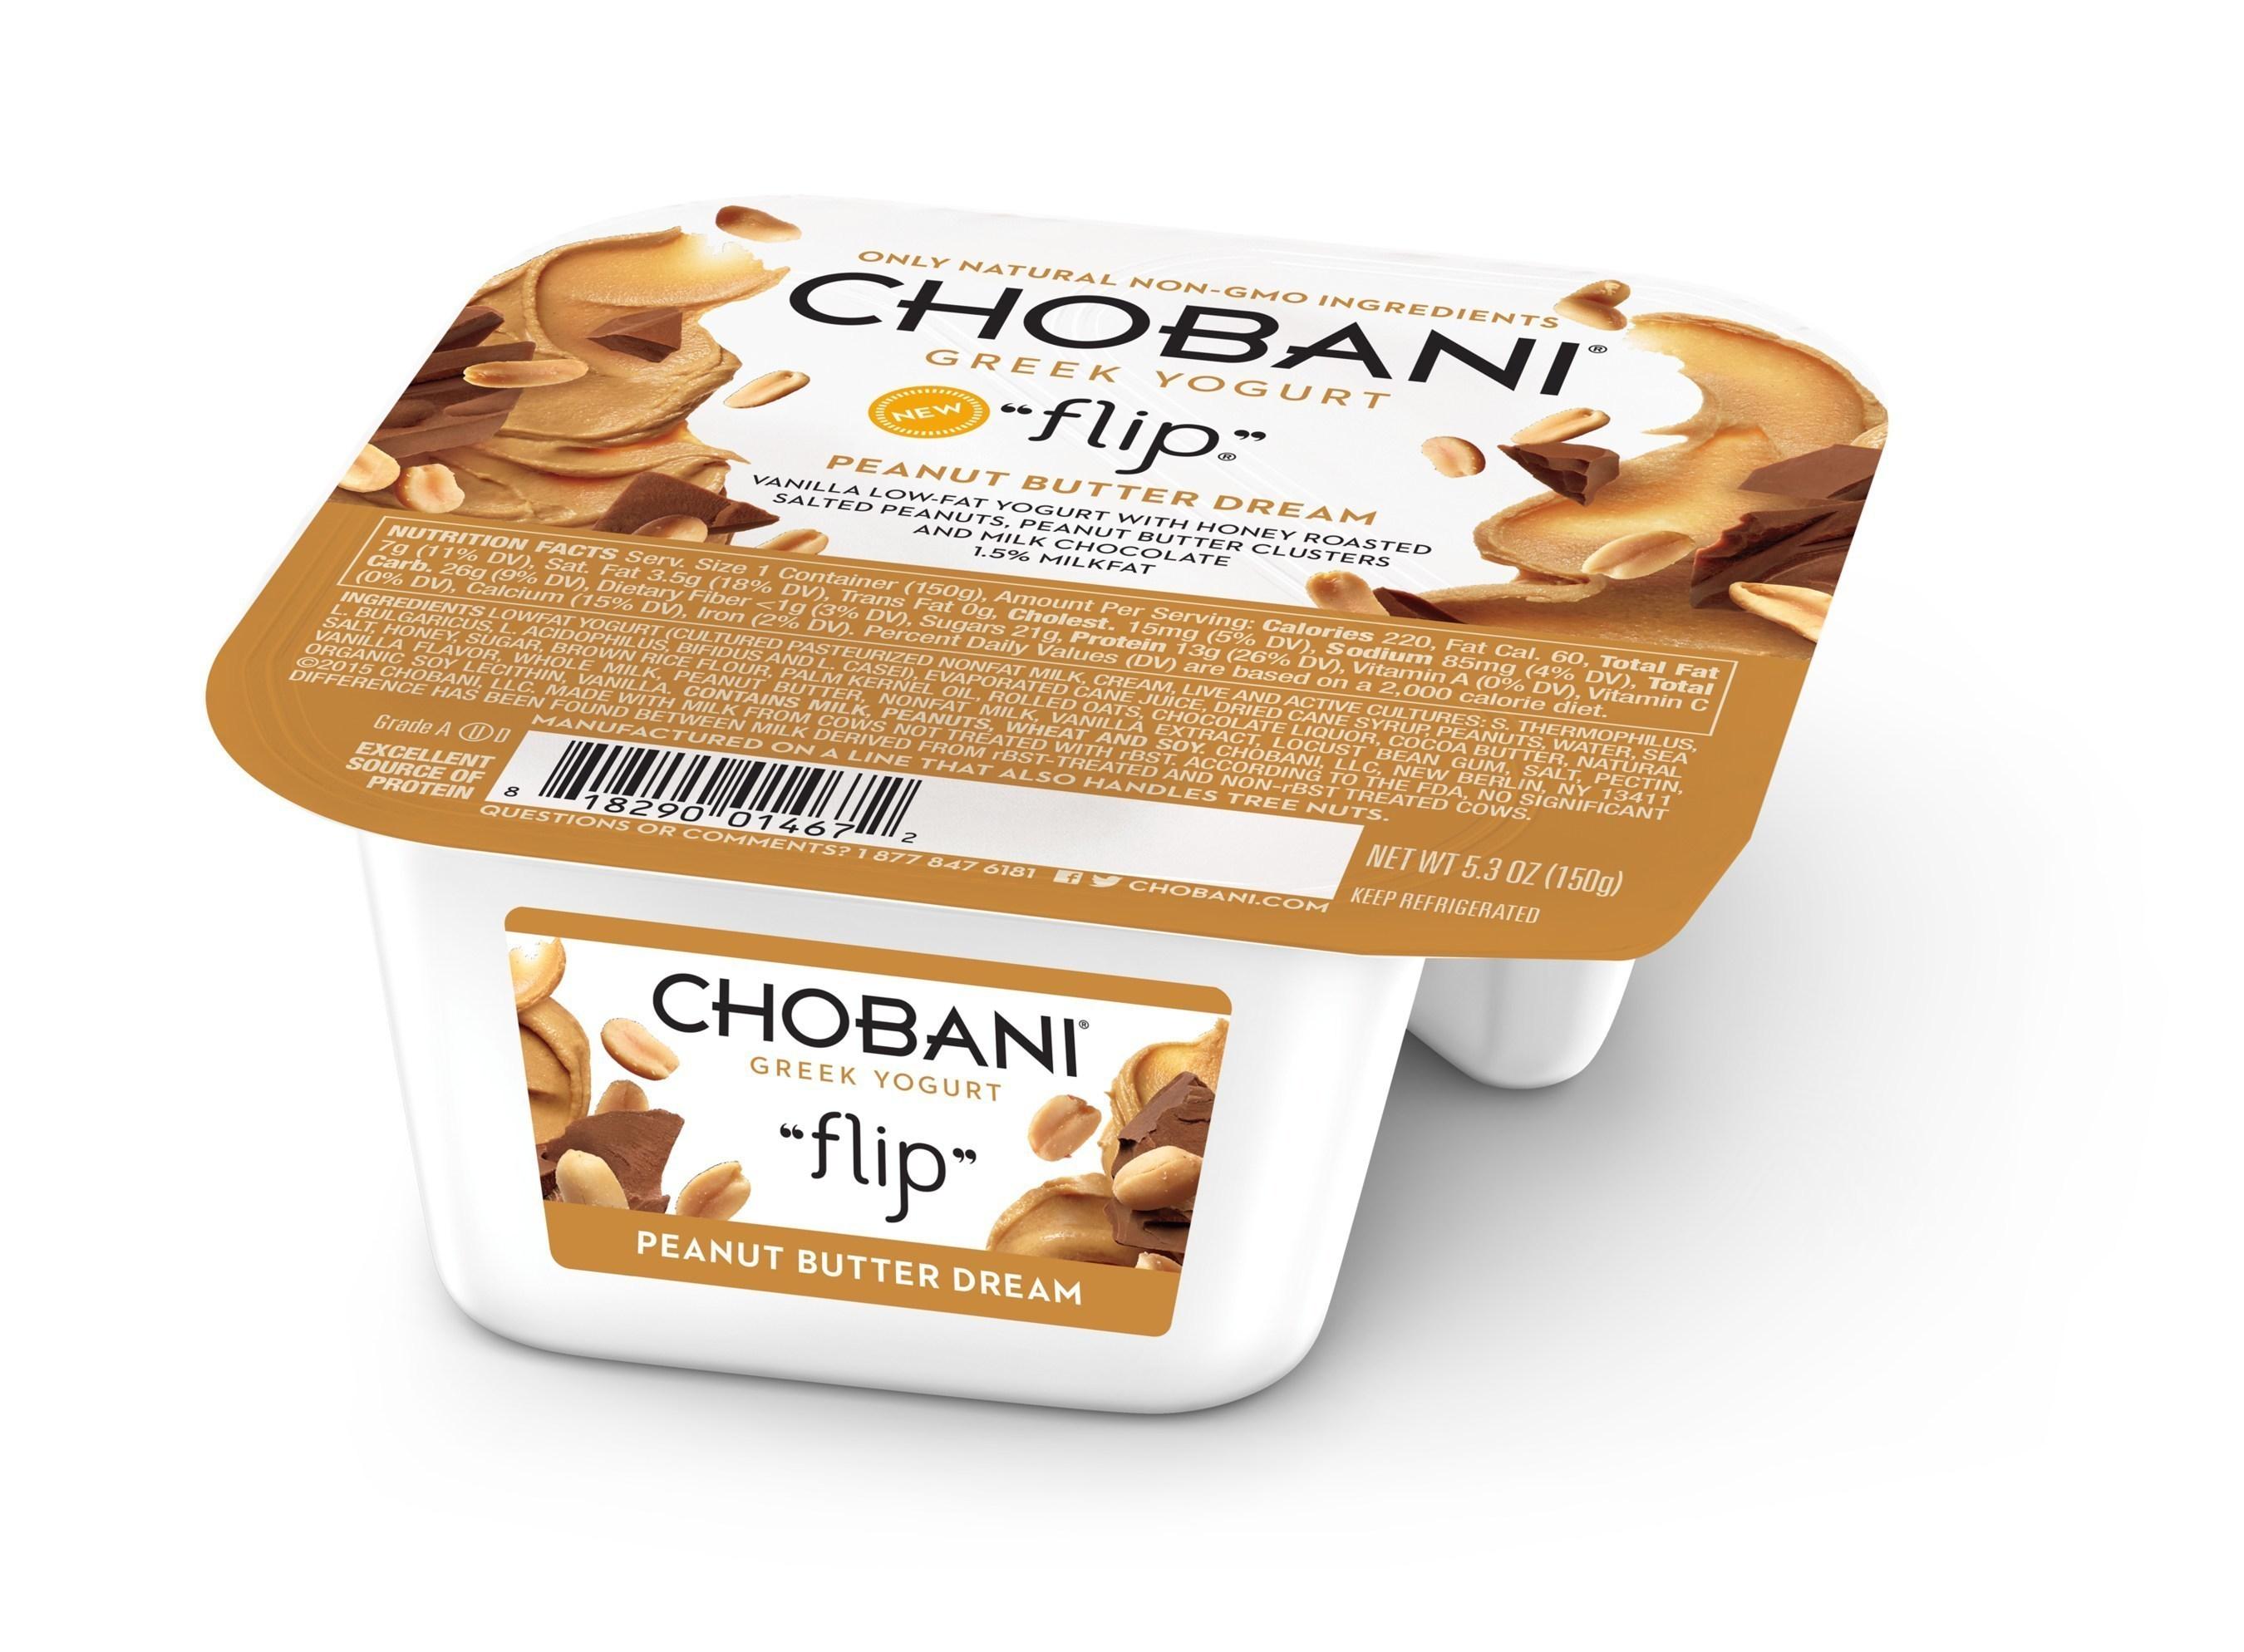 chobani making greek yogurt a household Chobani celebrates 10 years by saying thanks to fans and offering free yogurt to all chobani® greek yogurt chobani celebrates 10 years by saying thanks.